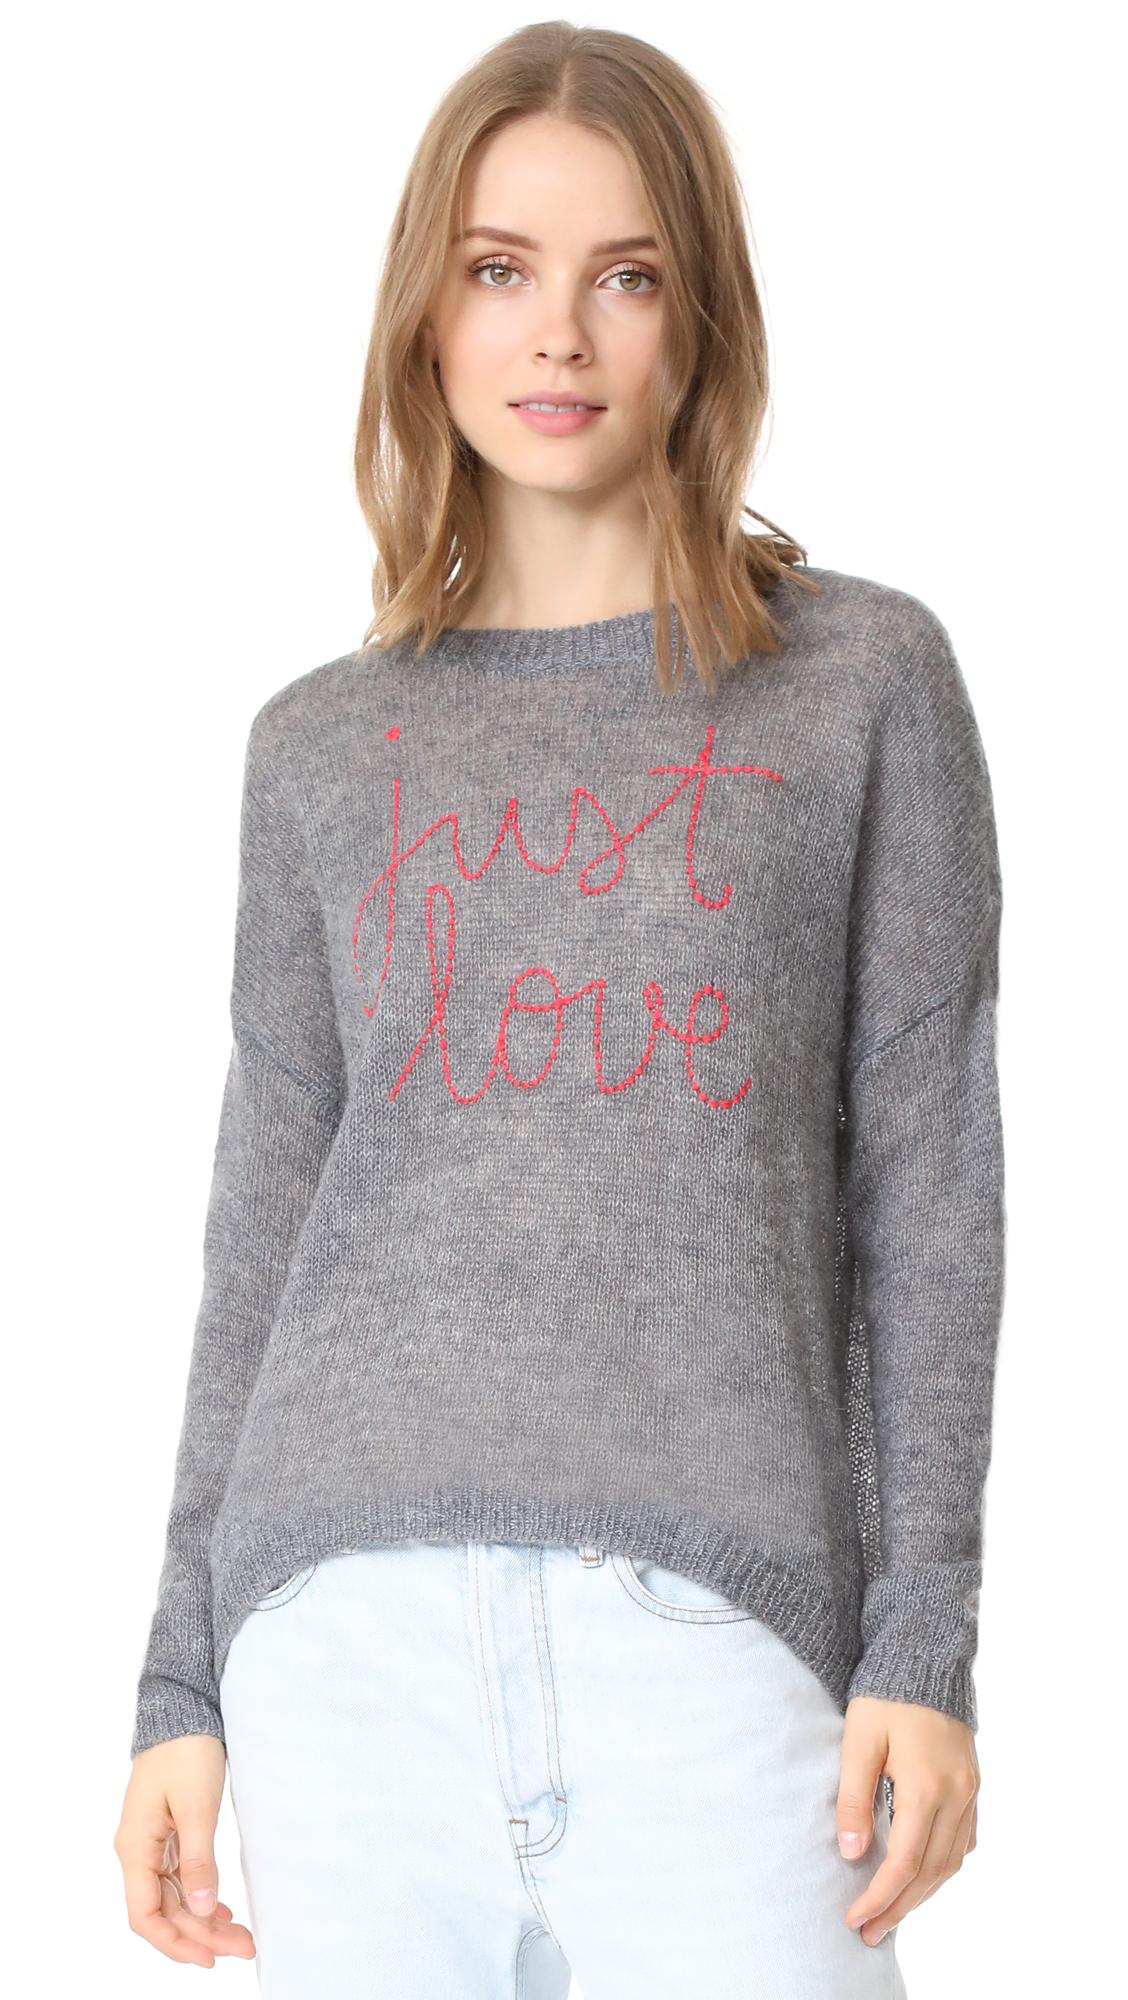 SUNDRY Just Love Sweater